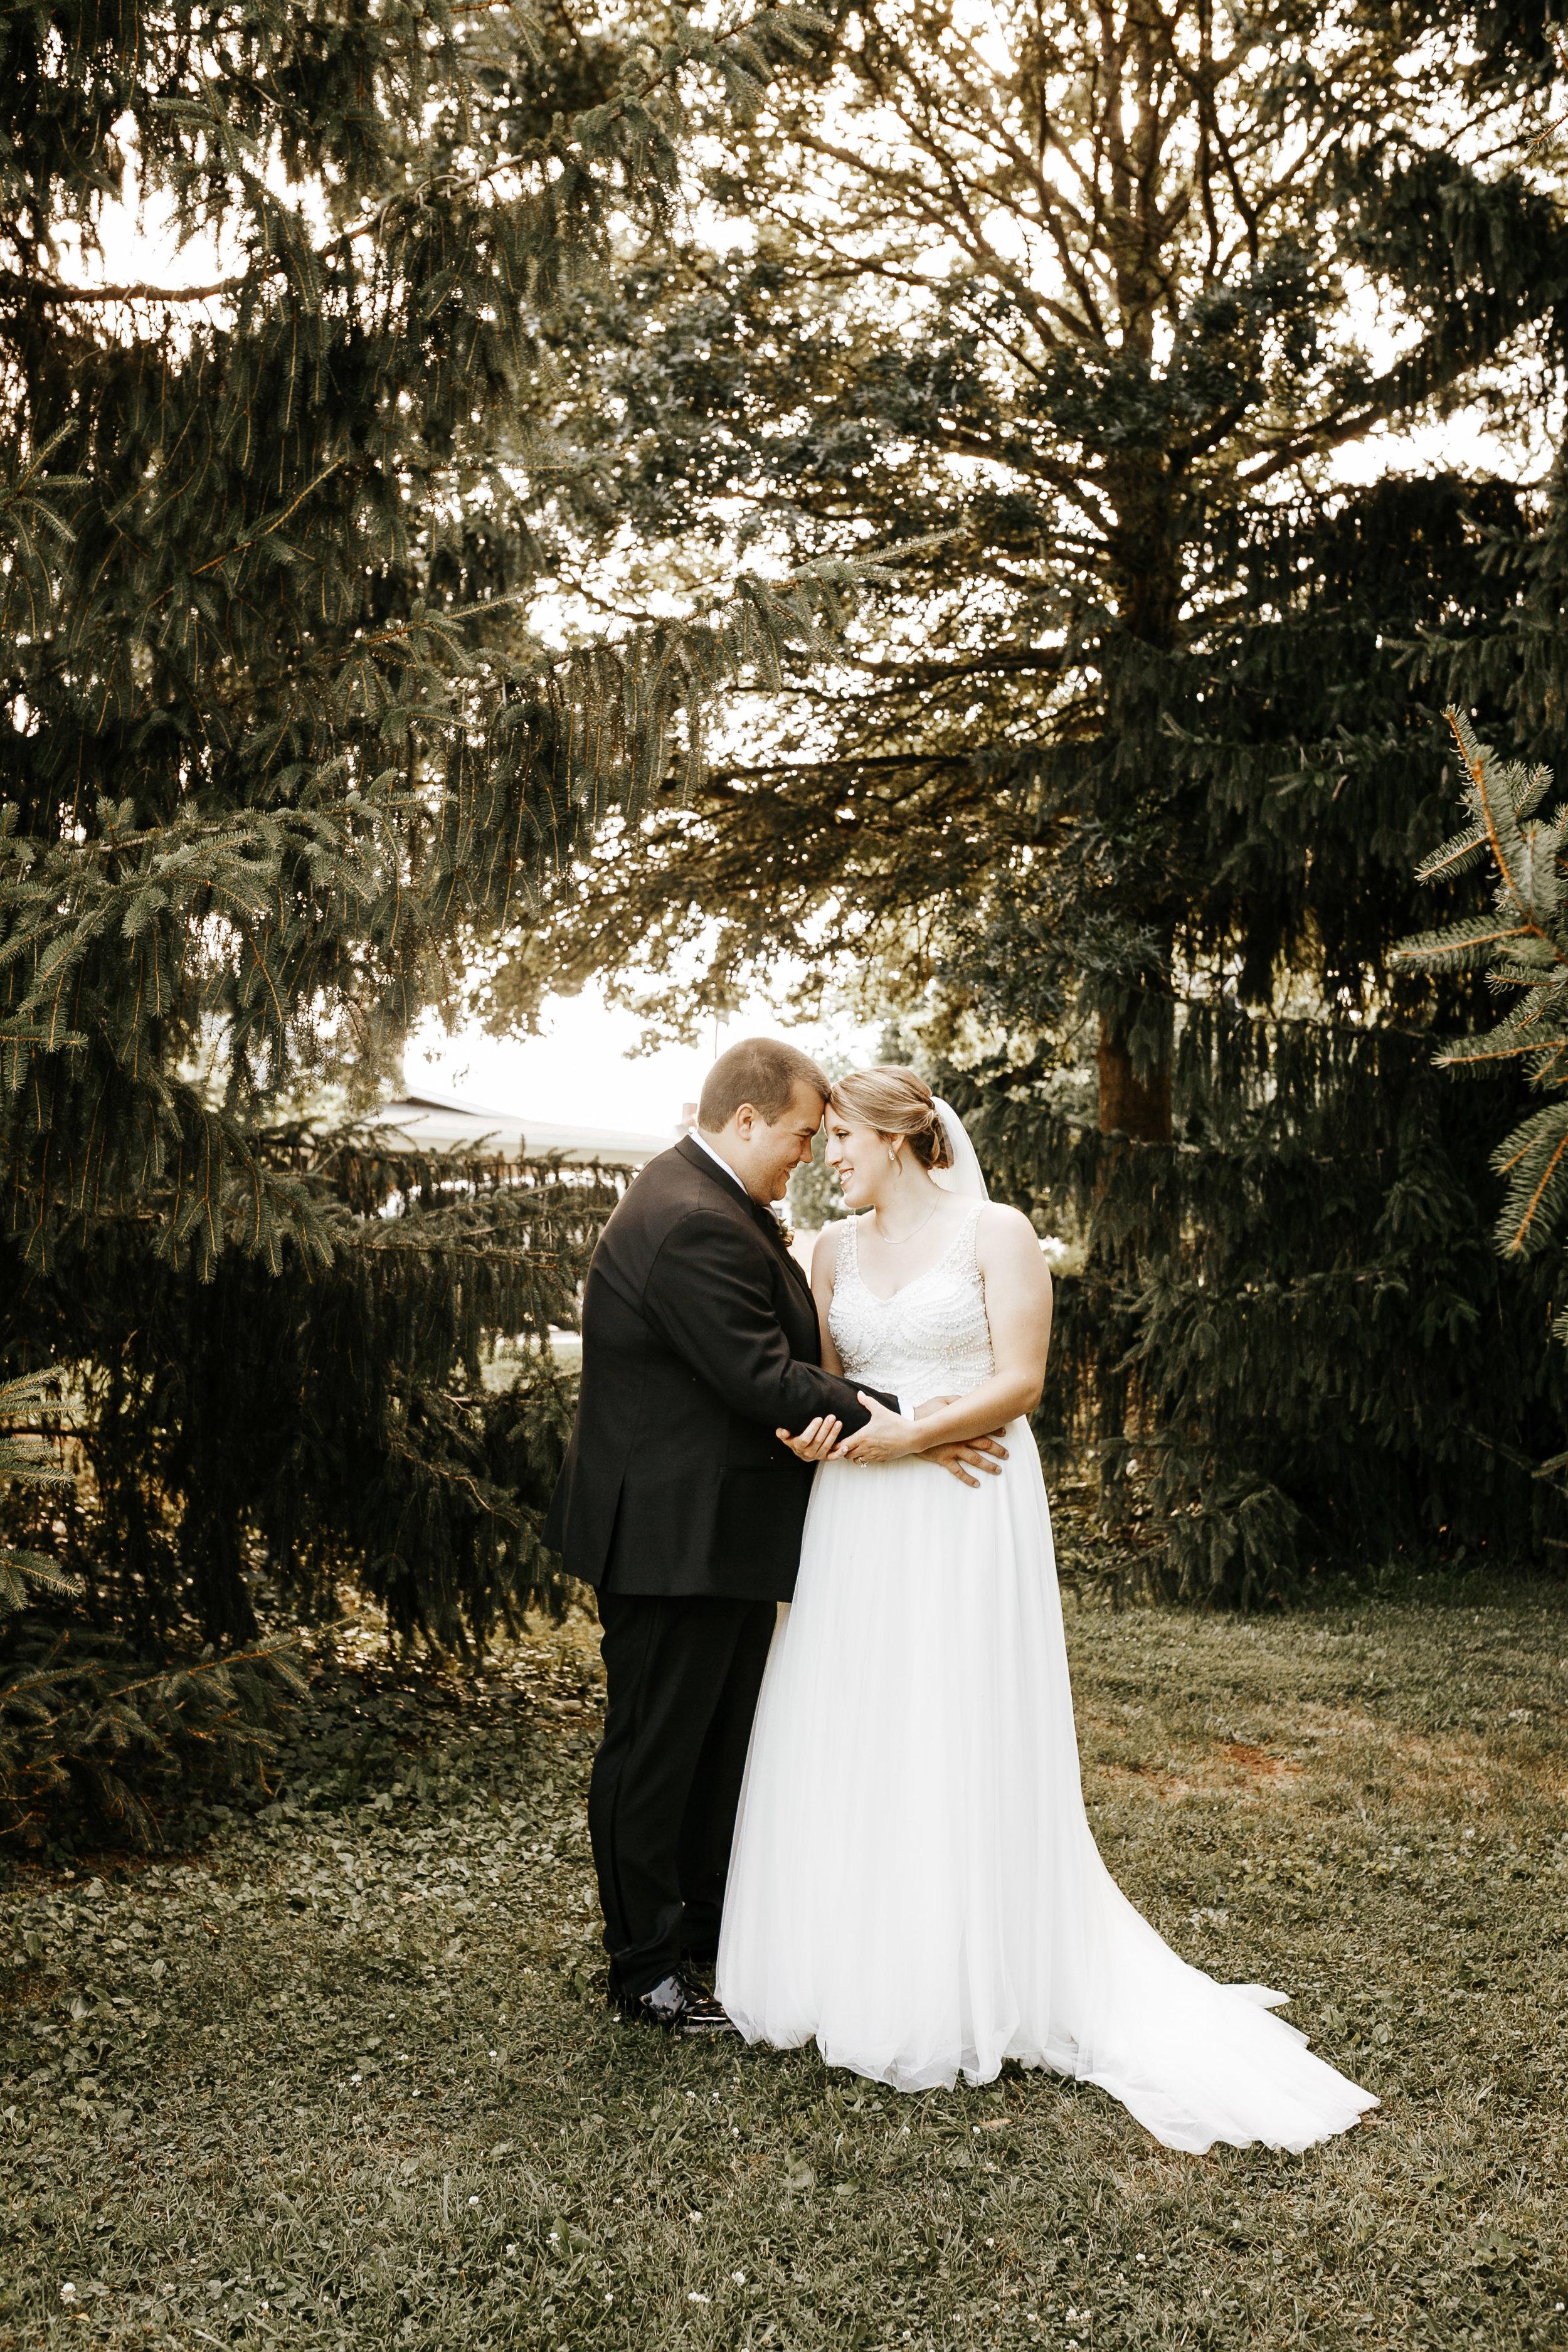 bohemian-photographer-wedding-tennessee-44.jpg